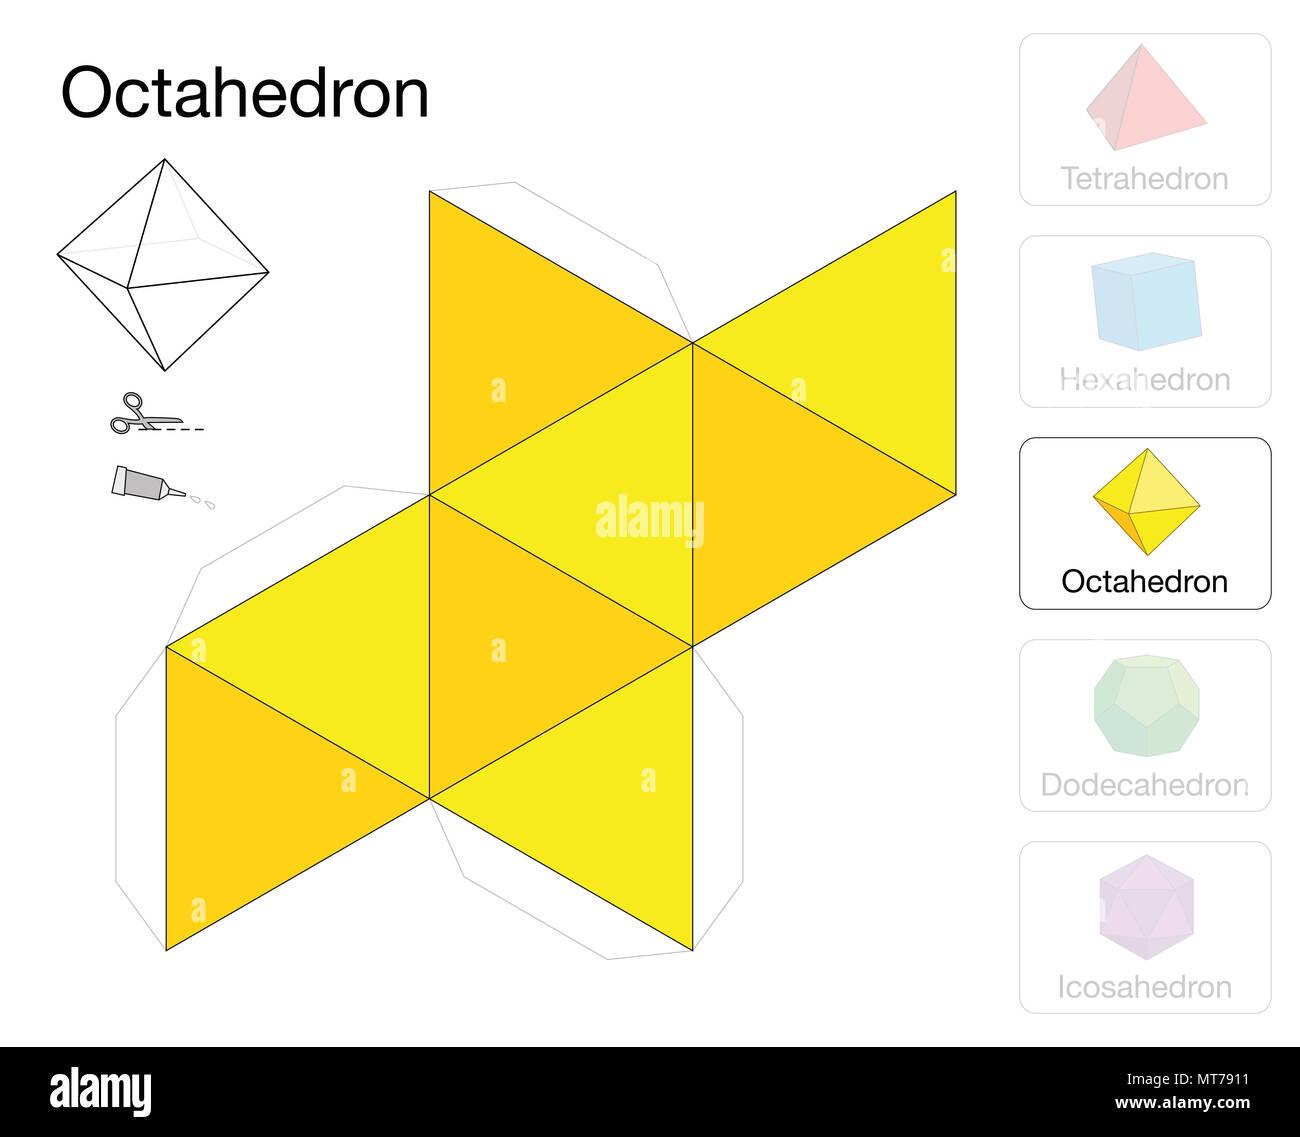 Modular Origami Octahedral Unit Folding Instructions | 1137x1300